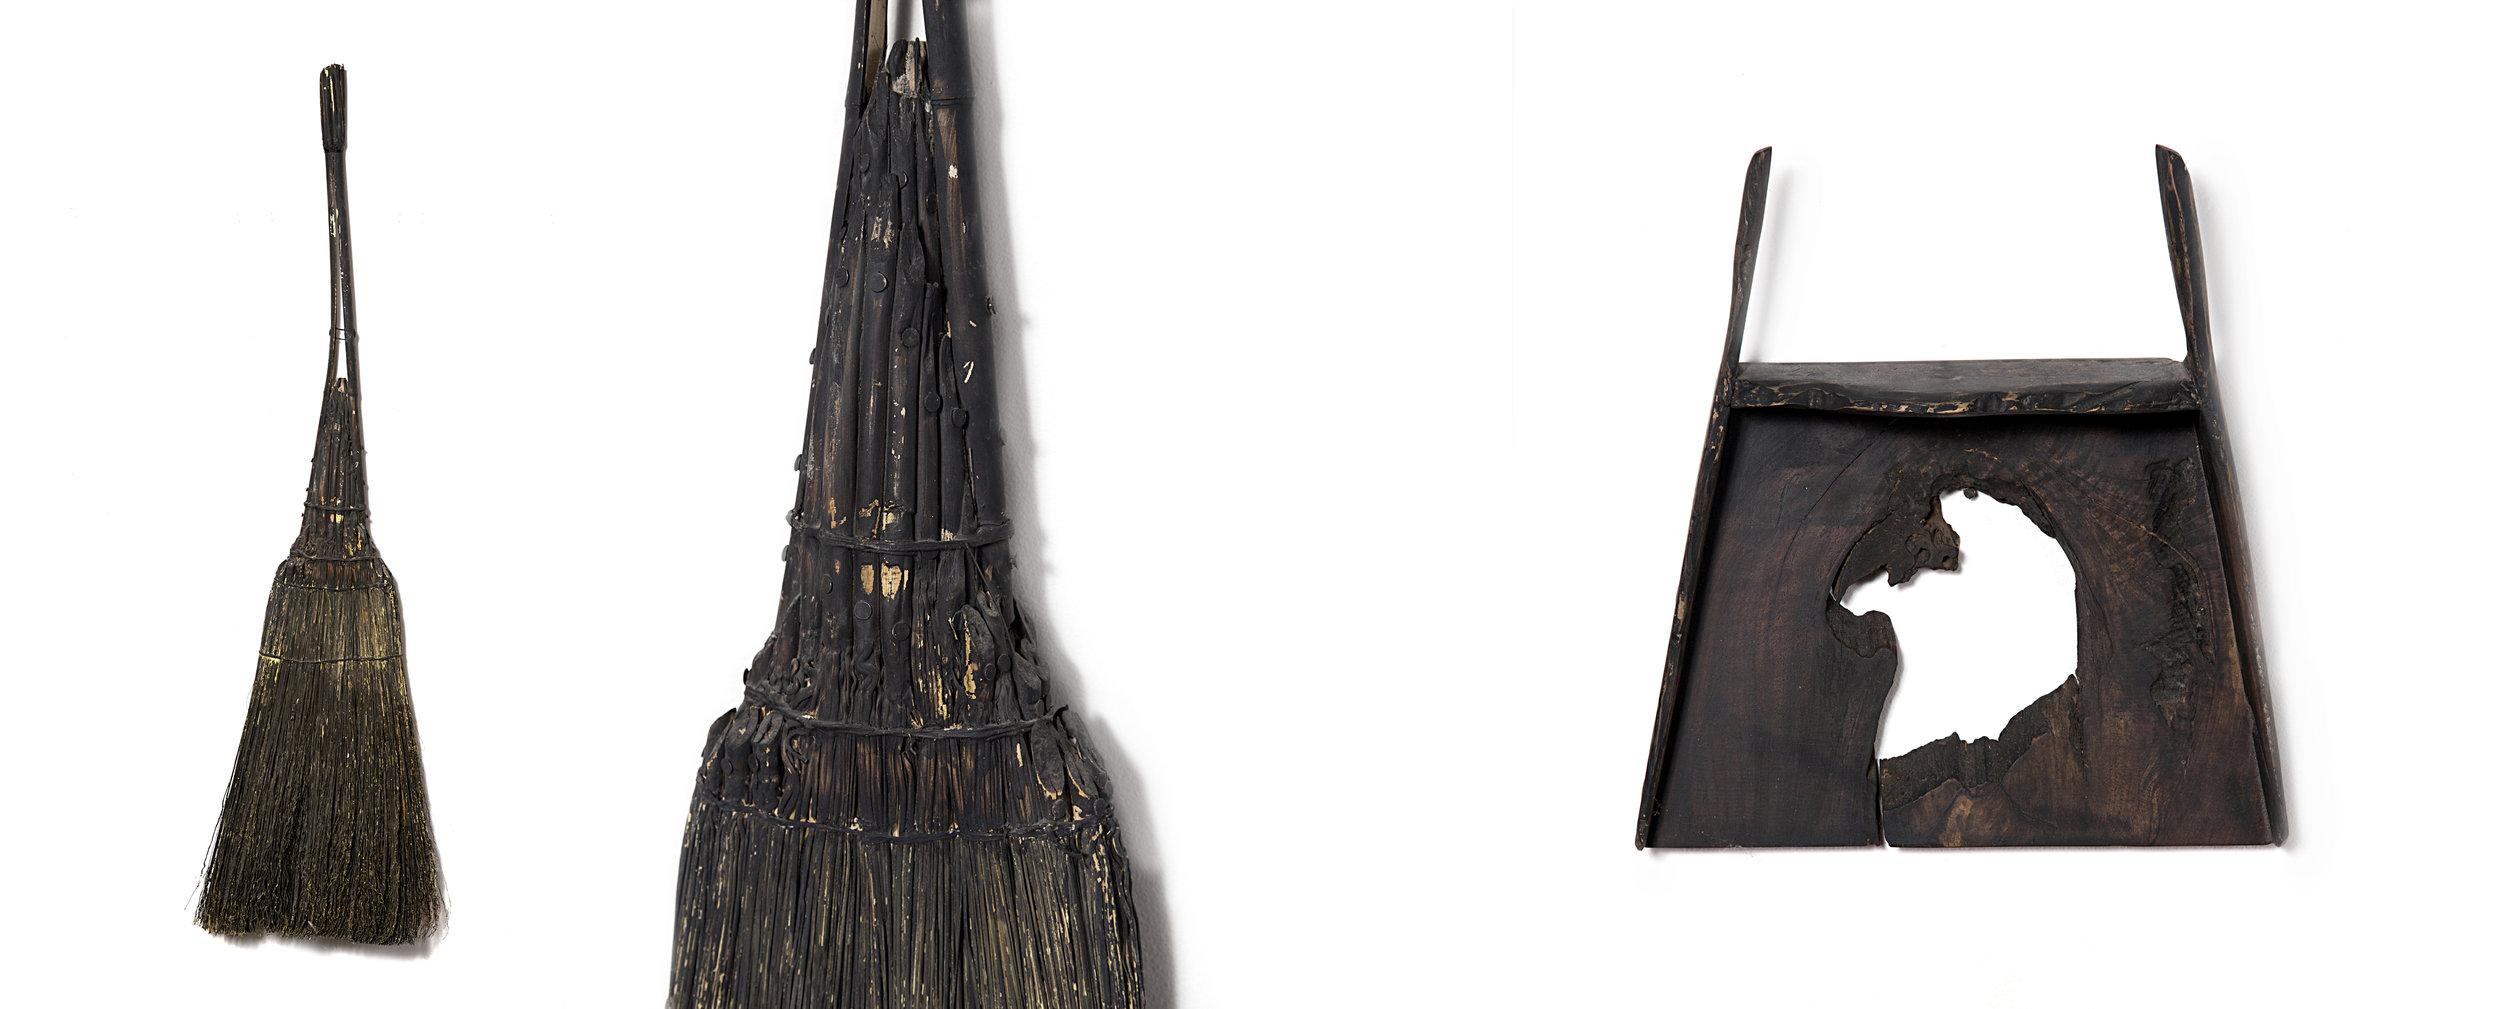 "untitled black broom  (with detail), broom corn, nails, tar,50""x14""x2"", 2015;  dustpan with hole , wood, milk paint, 13""x11""x3"",2014"